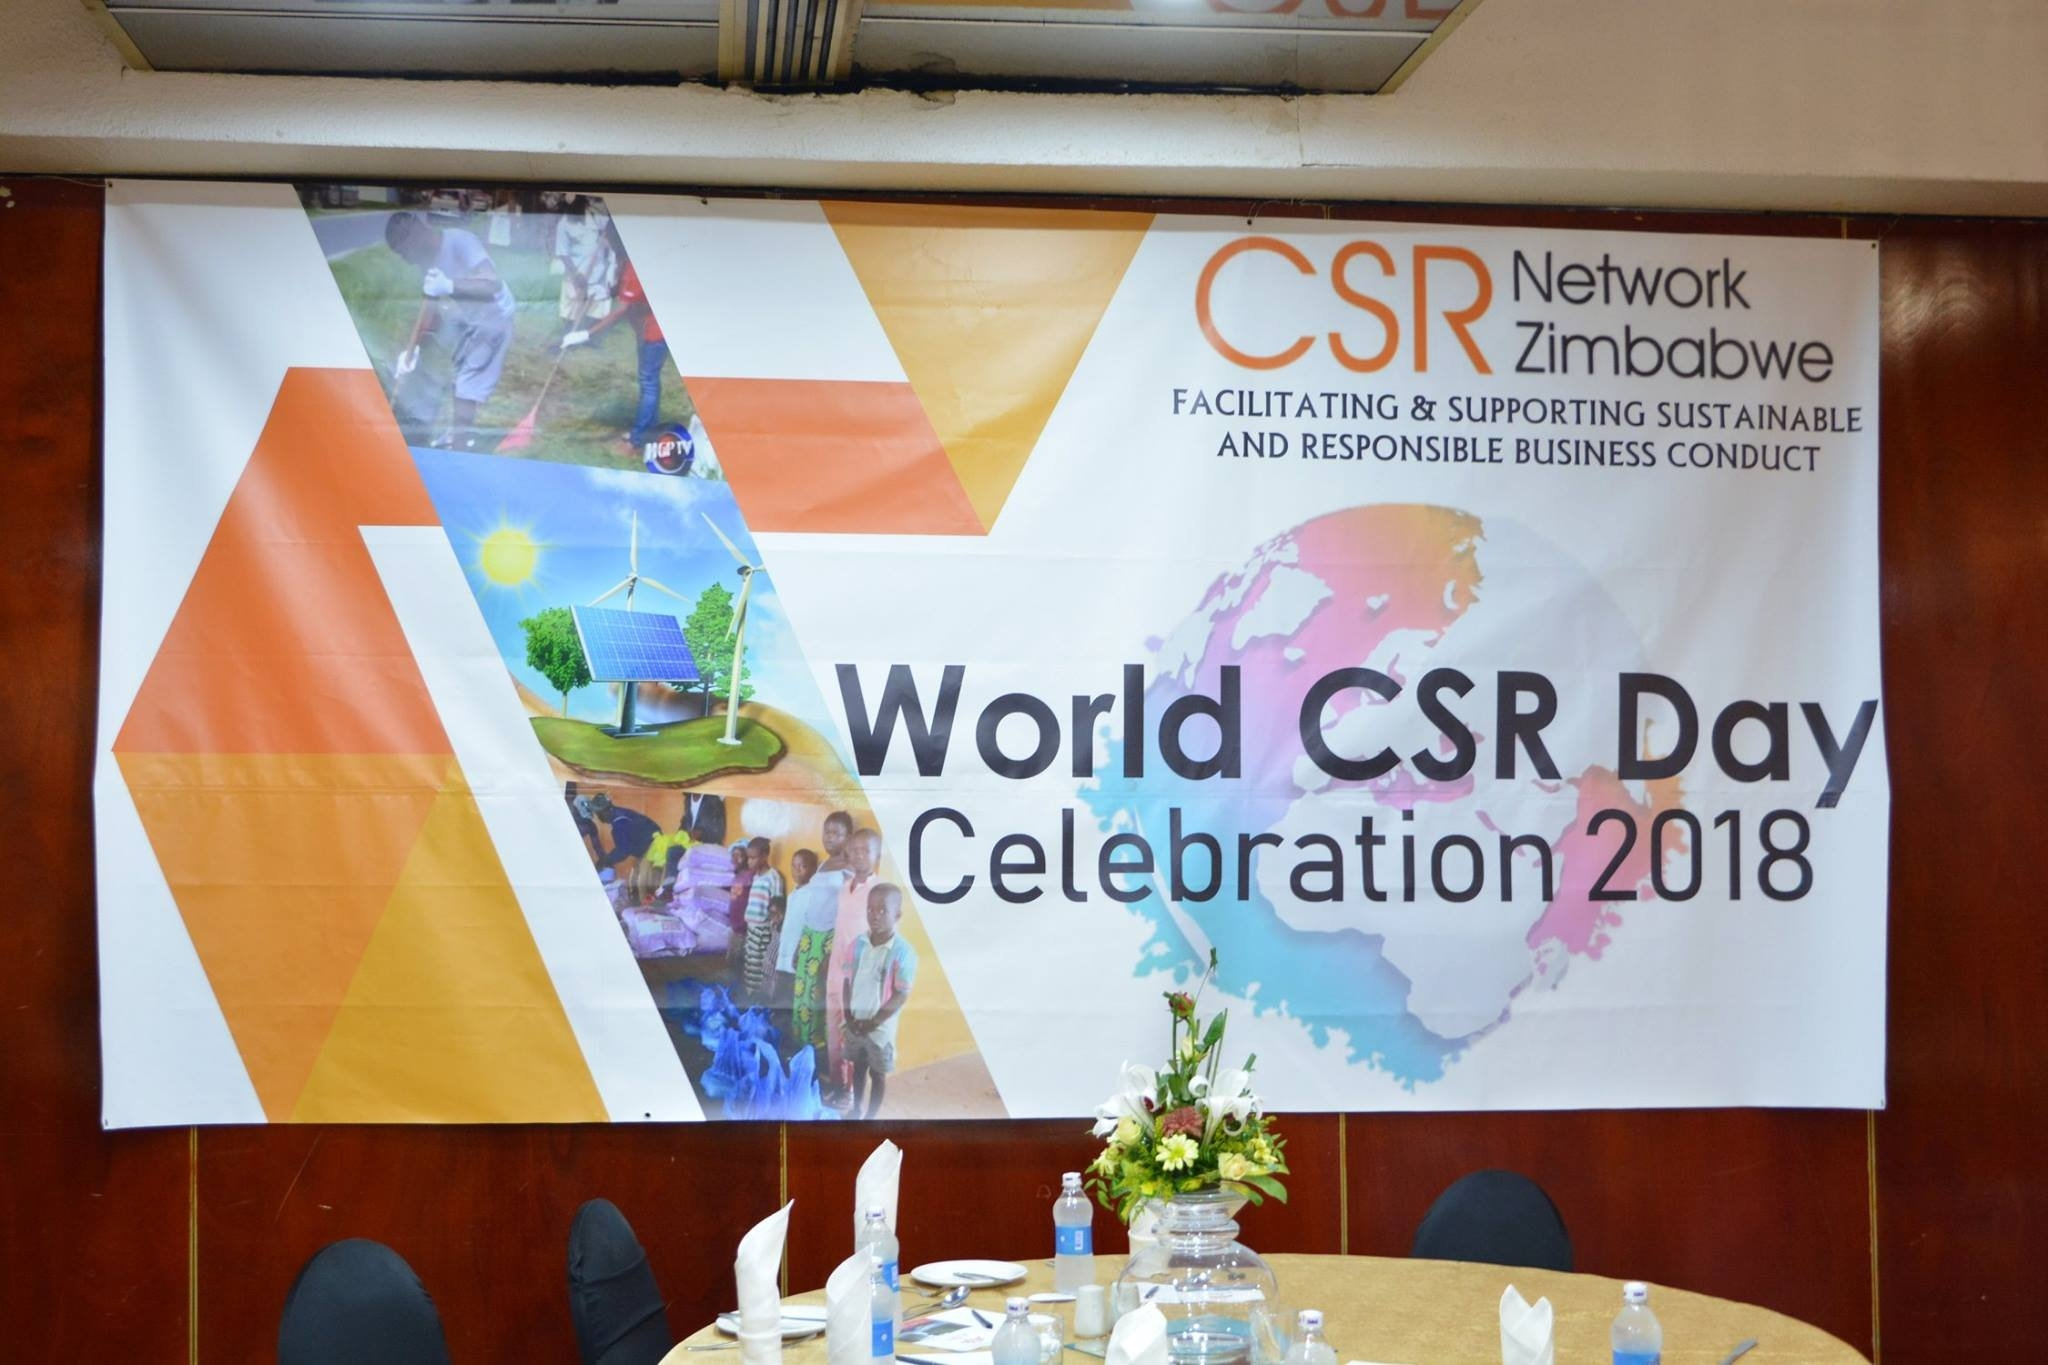 Csr Network Zim 2019 Activities Calendar – Csr Network Zimbabwe Calendar 2019 Zimbabwe